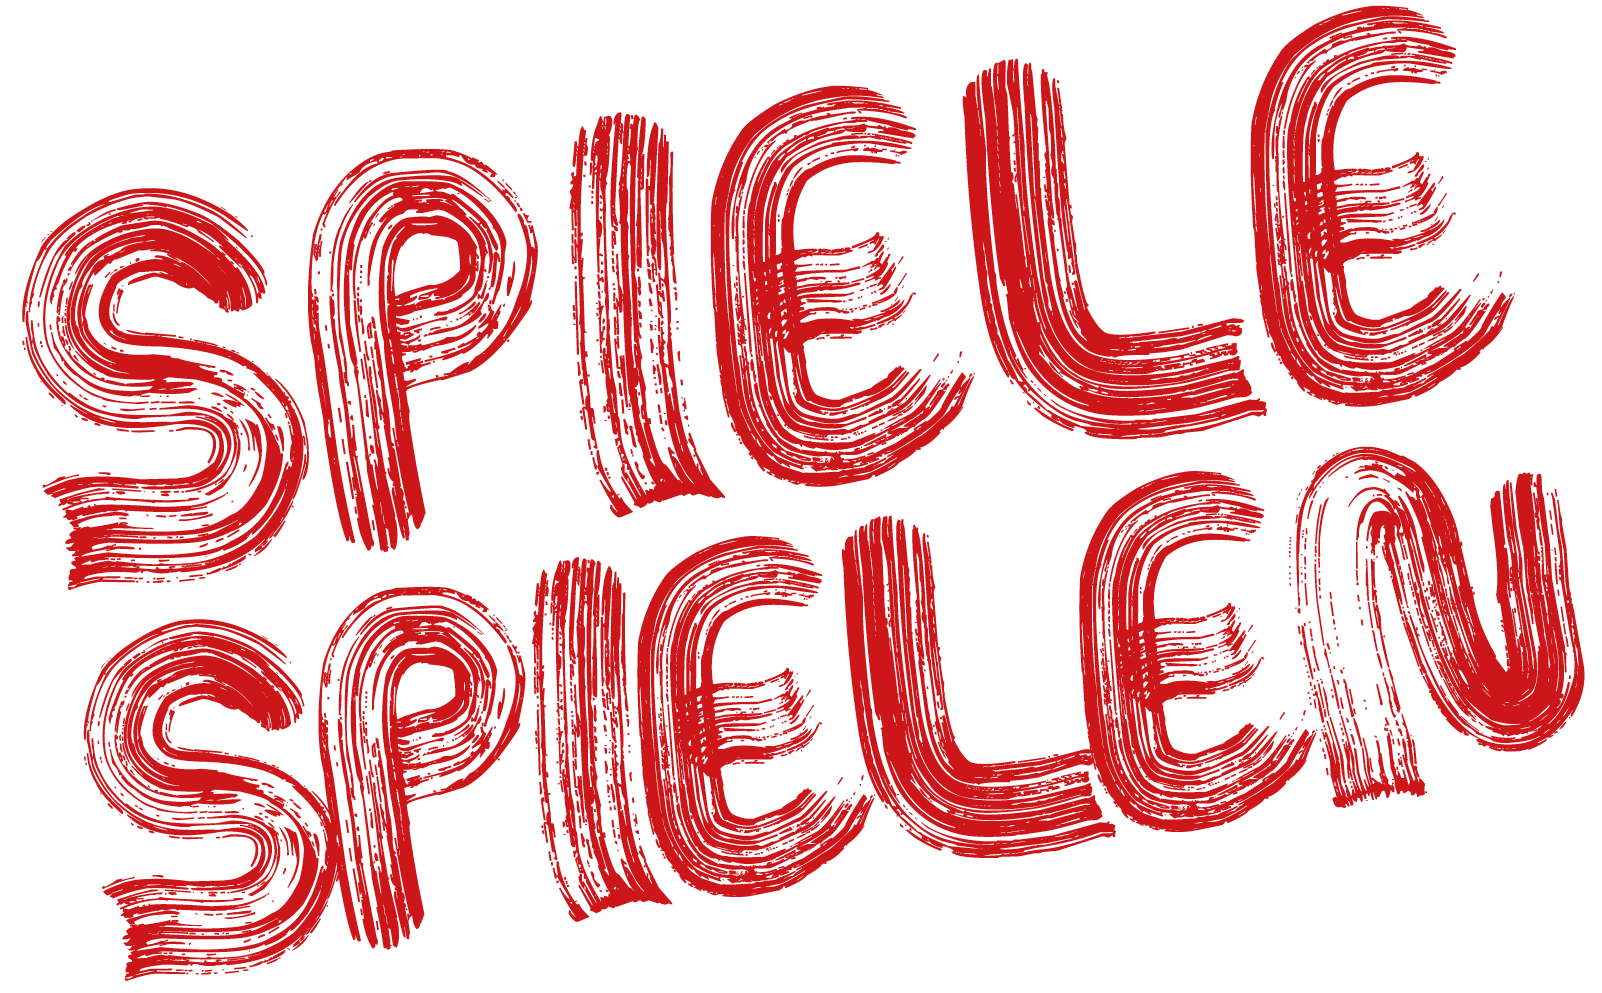 www.spiele spielen.com